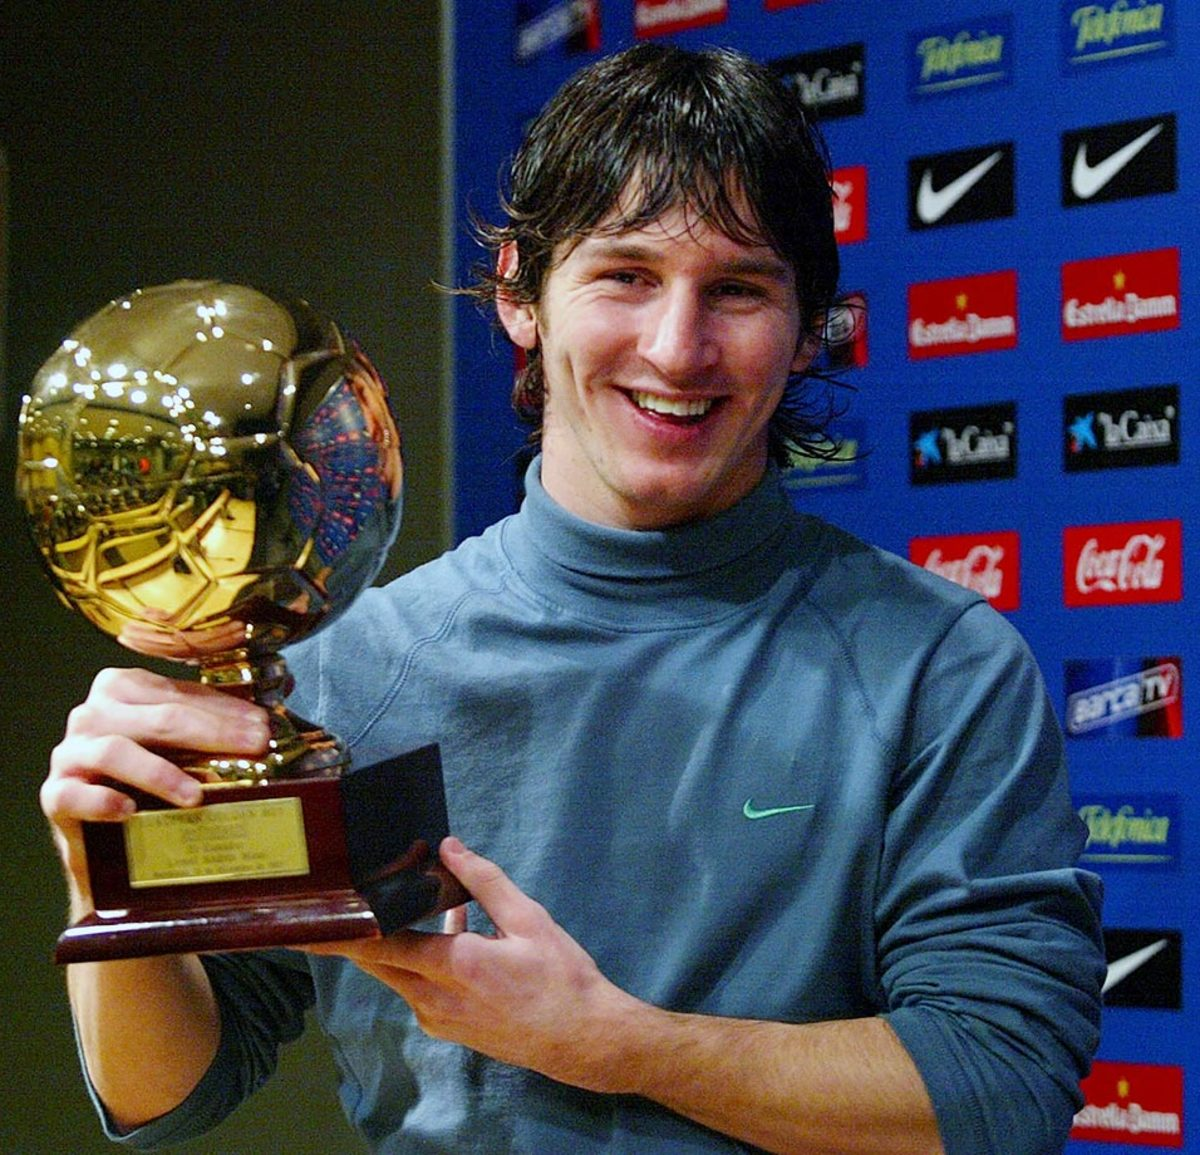 2005-1214-Lionel-Messi.jpg